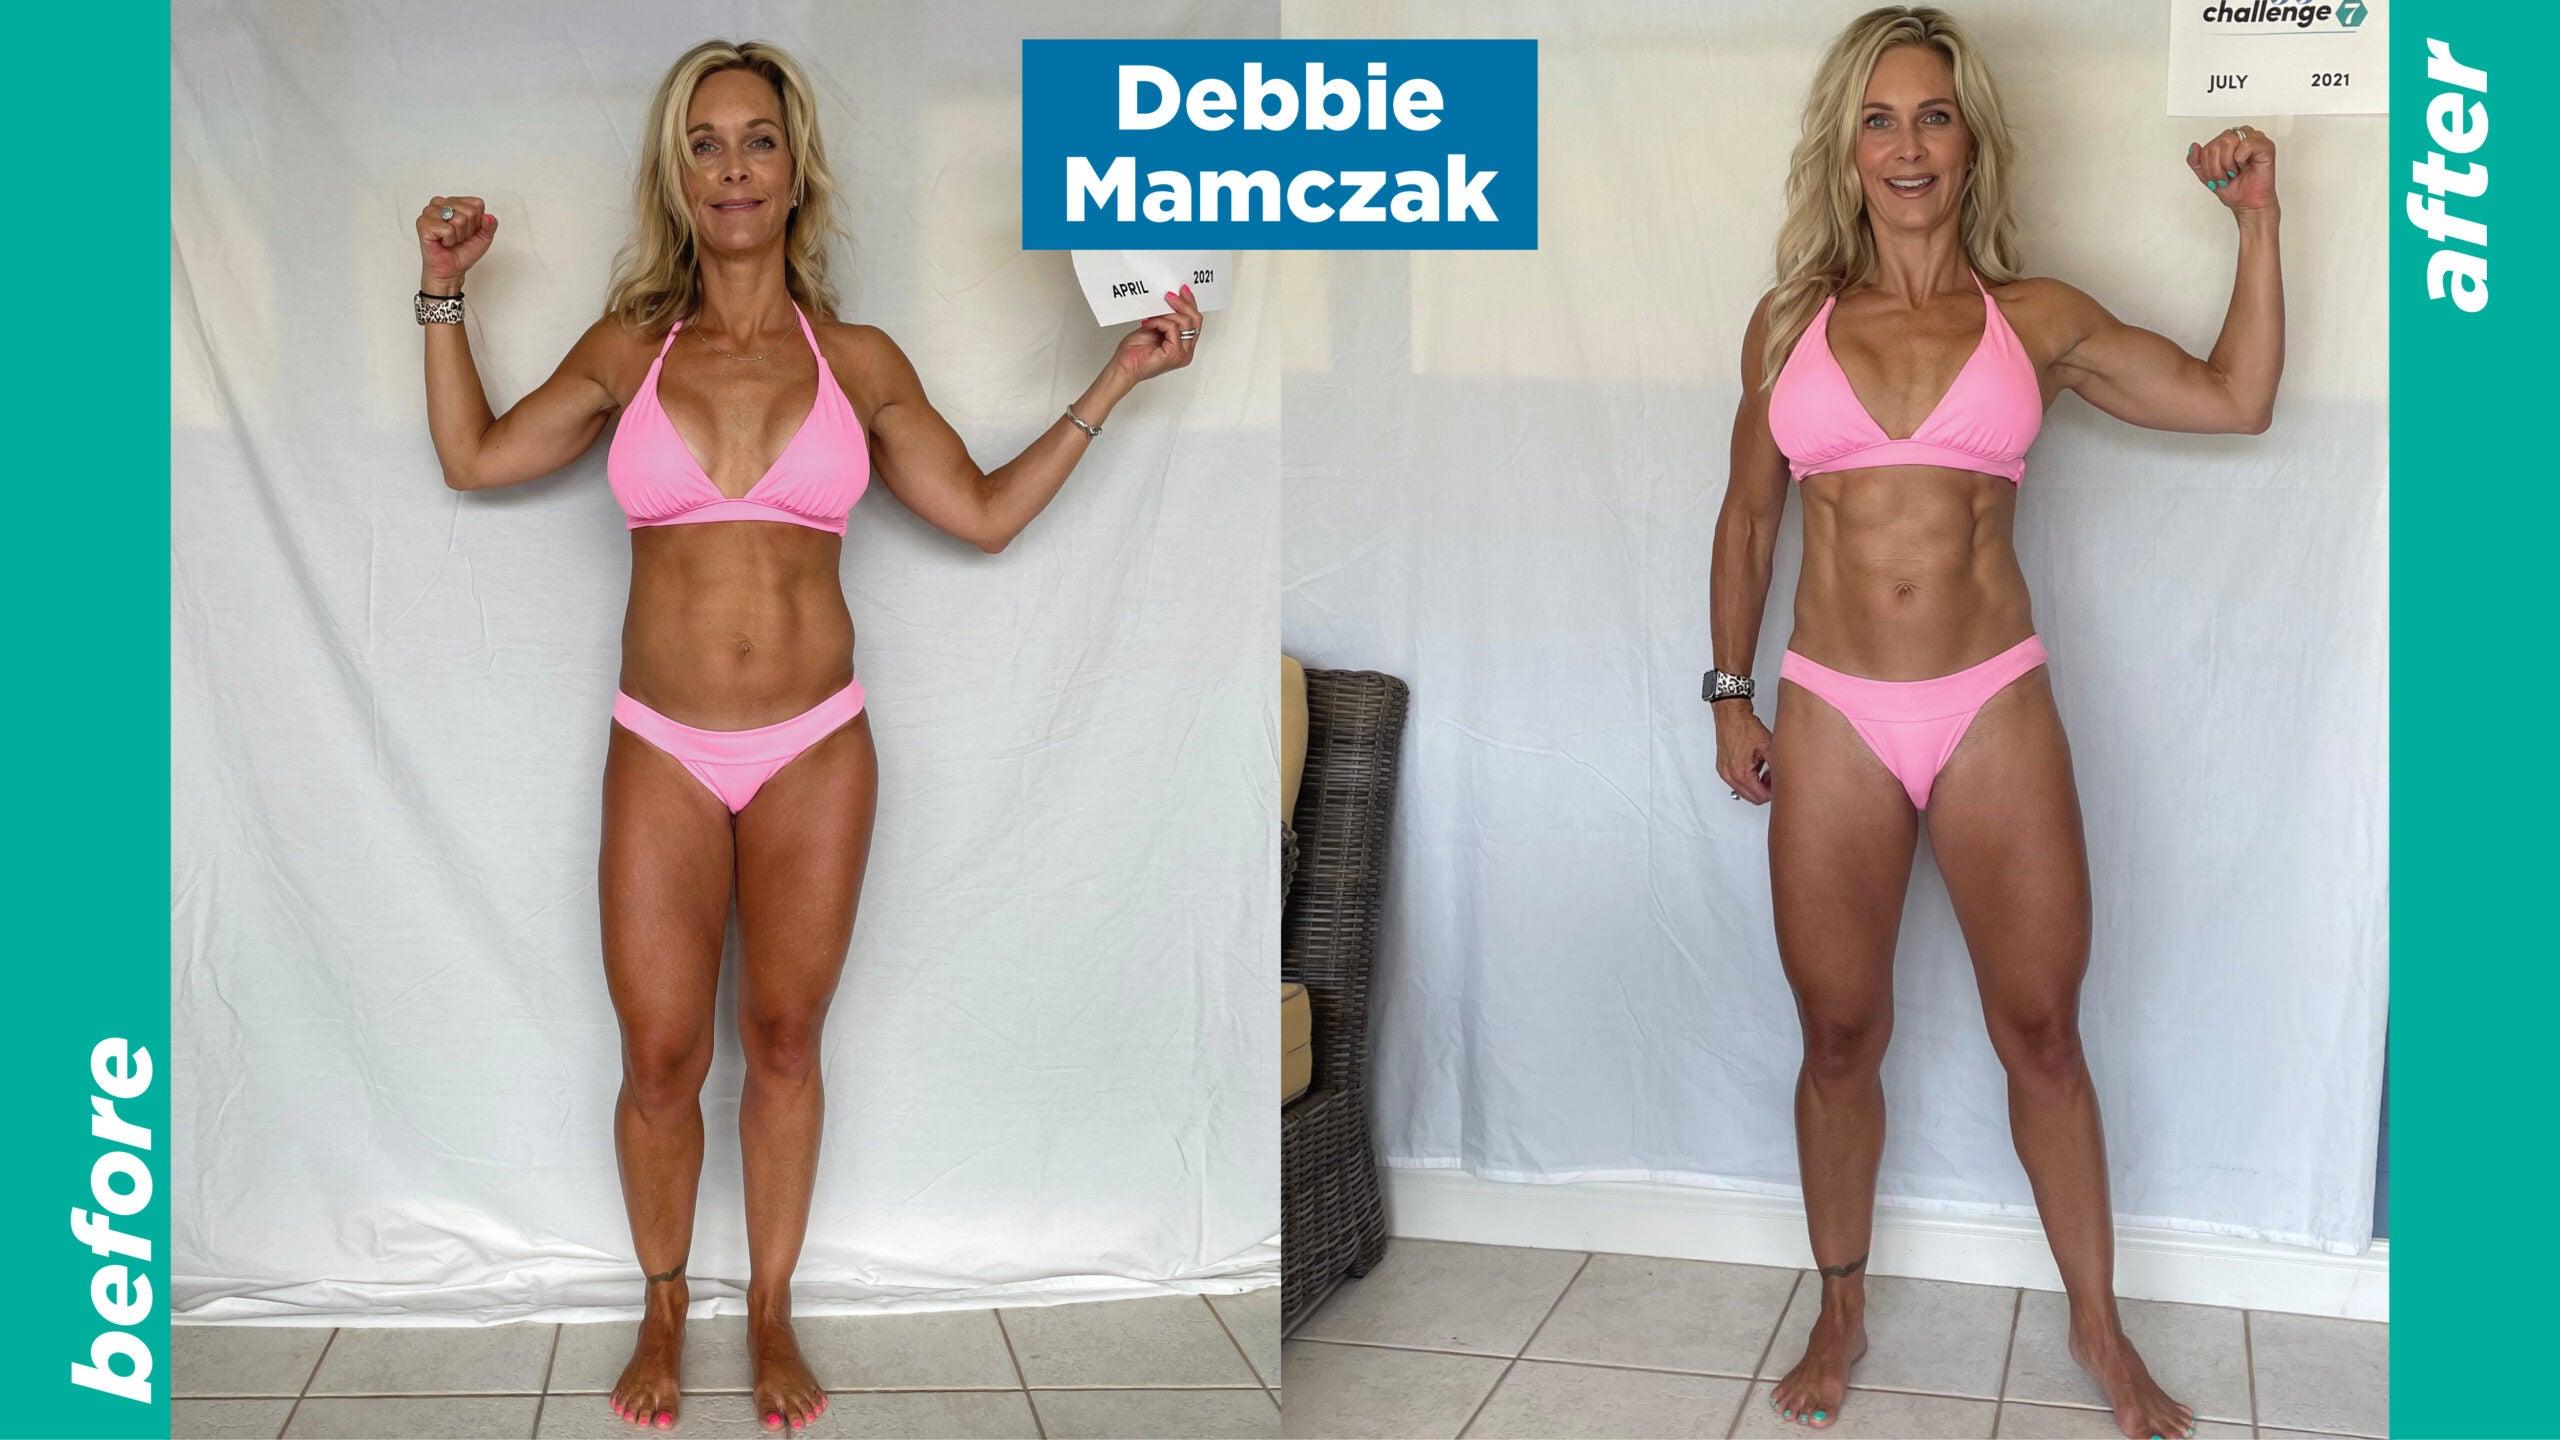 Debbie Mamczak 2